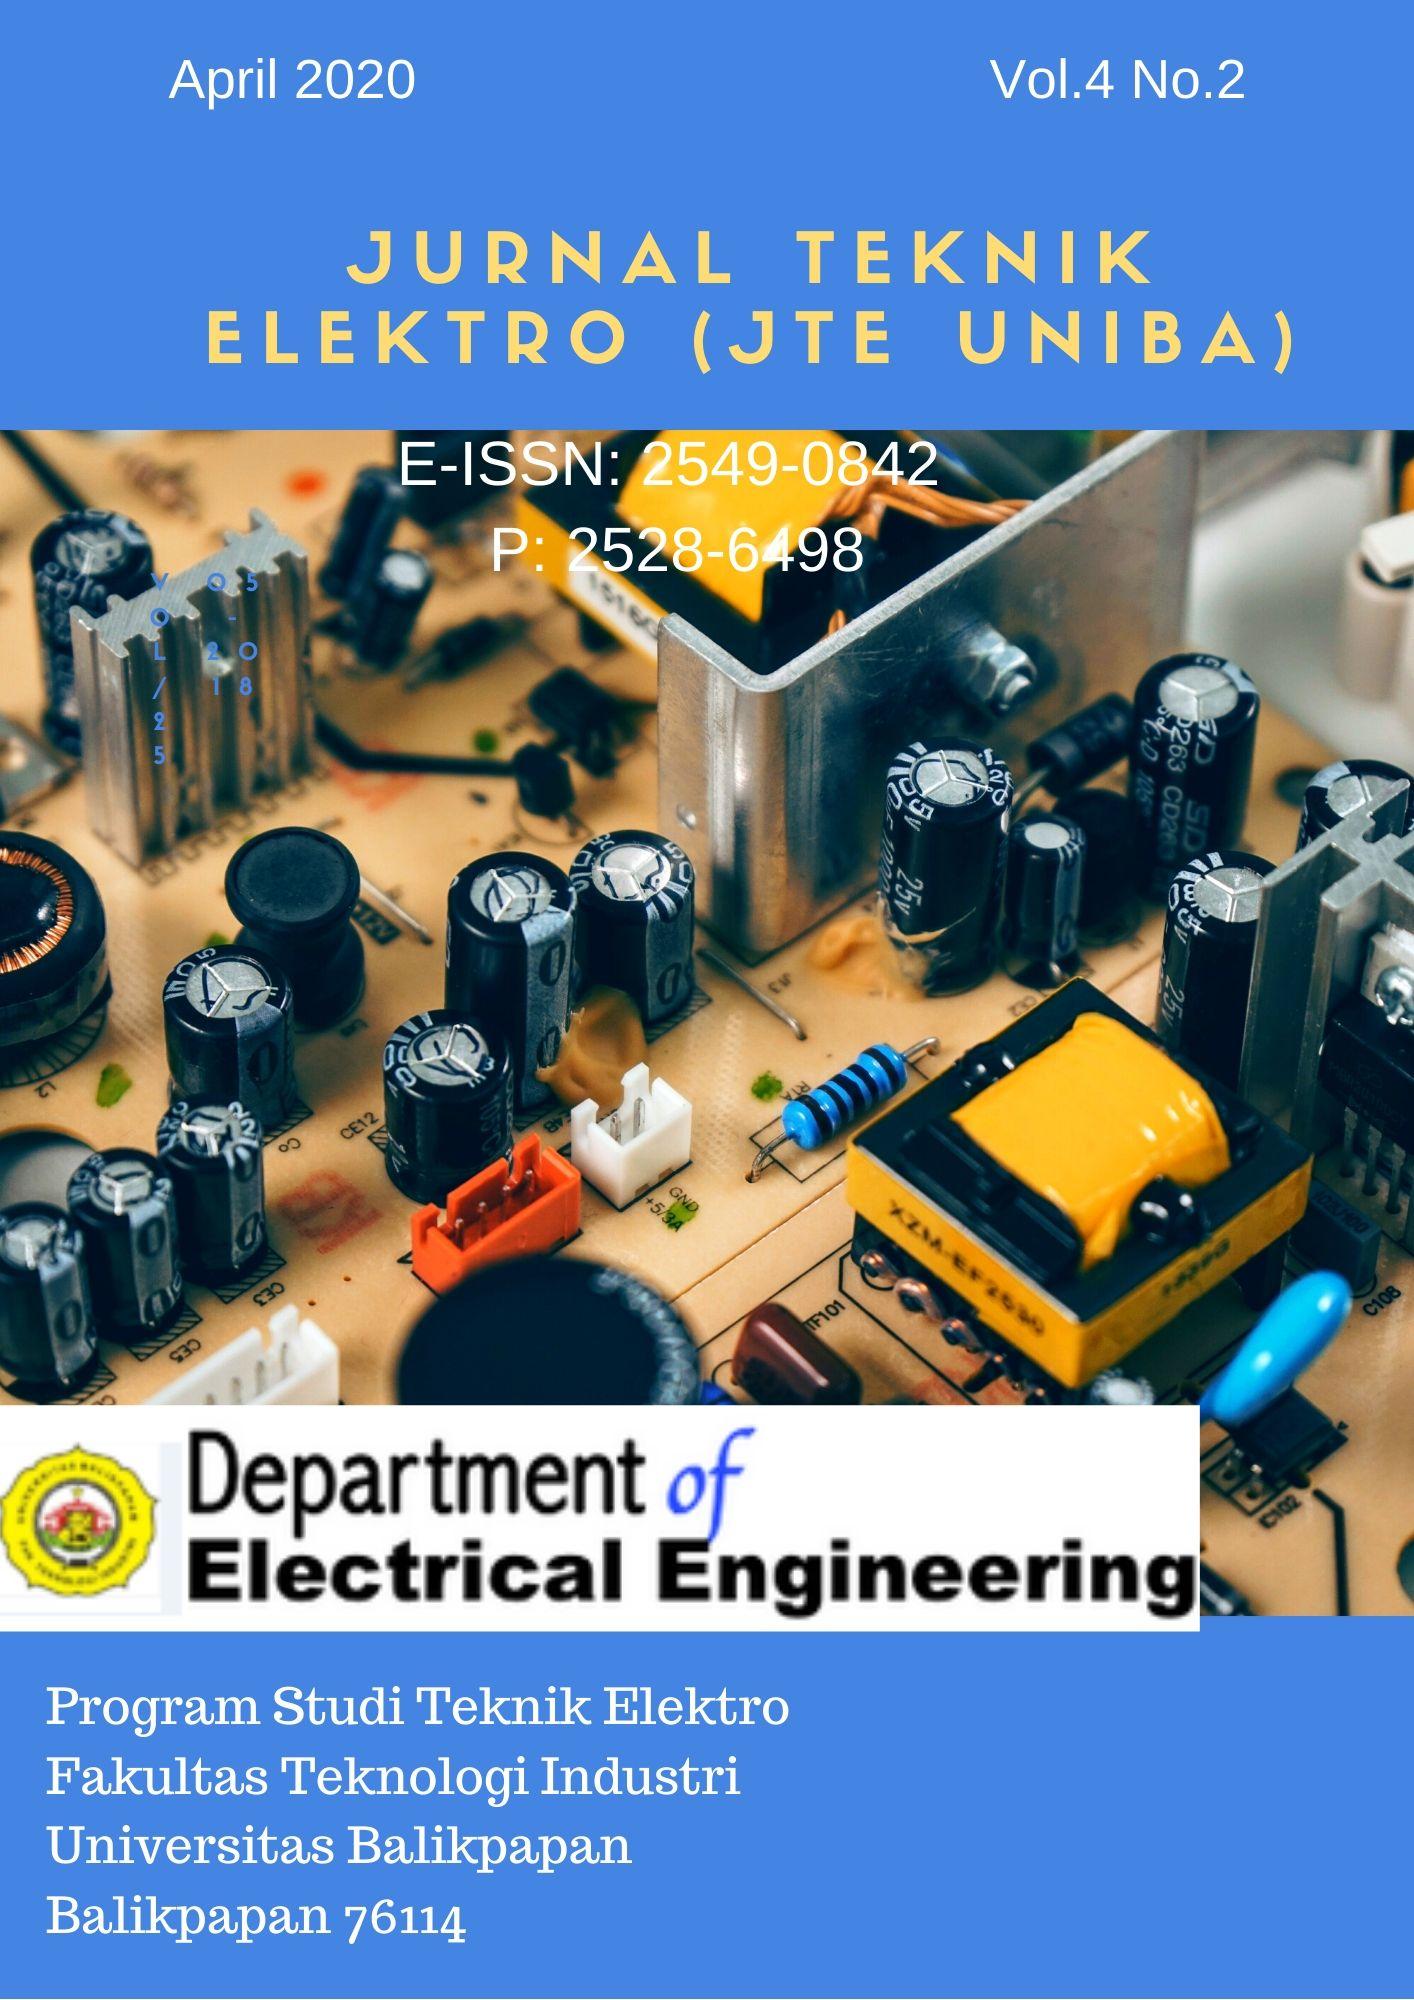 View Vol. 4 No. 2 (2020): JTE UNIBA (Jurnal Teknik Elektro Uniba)